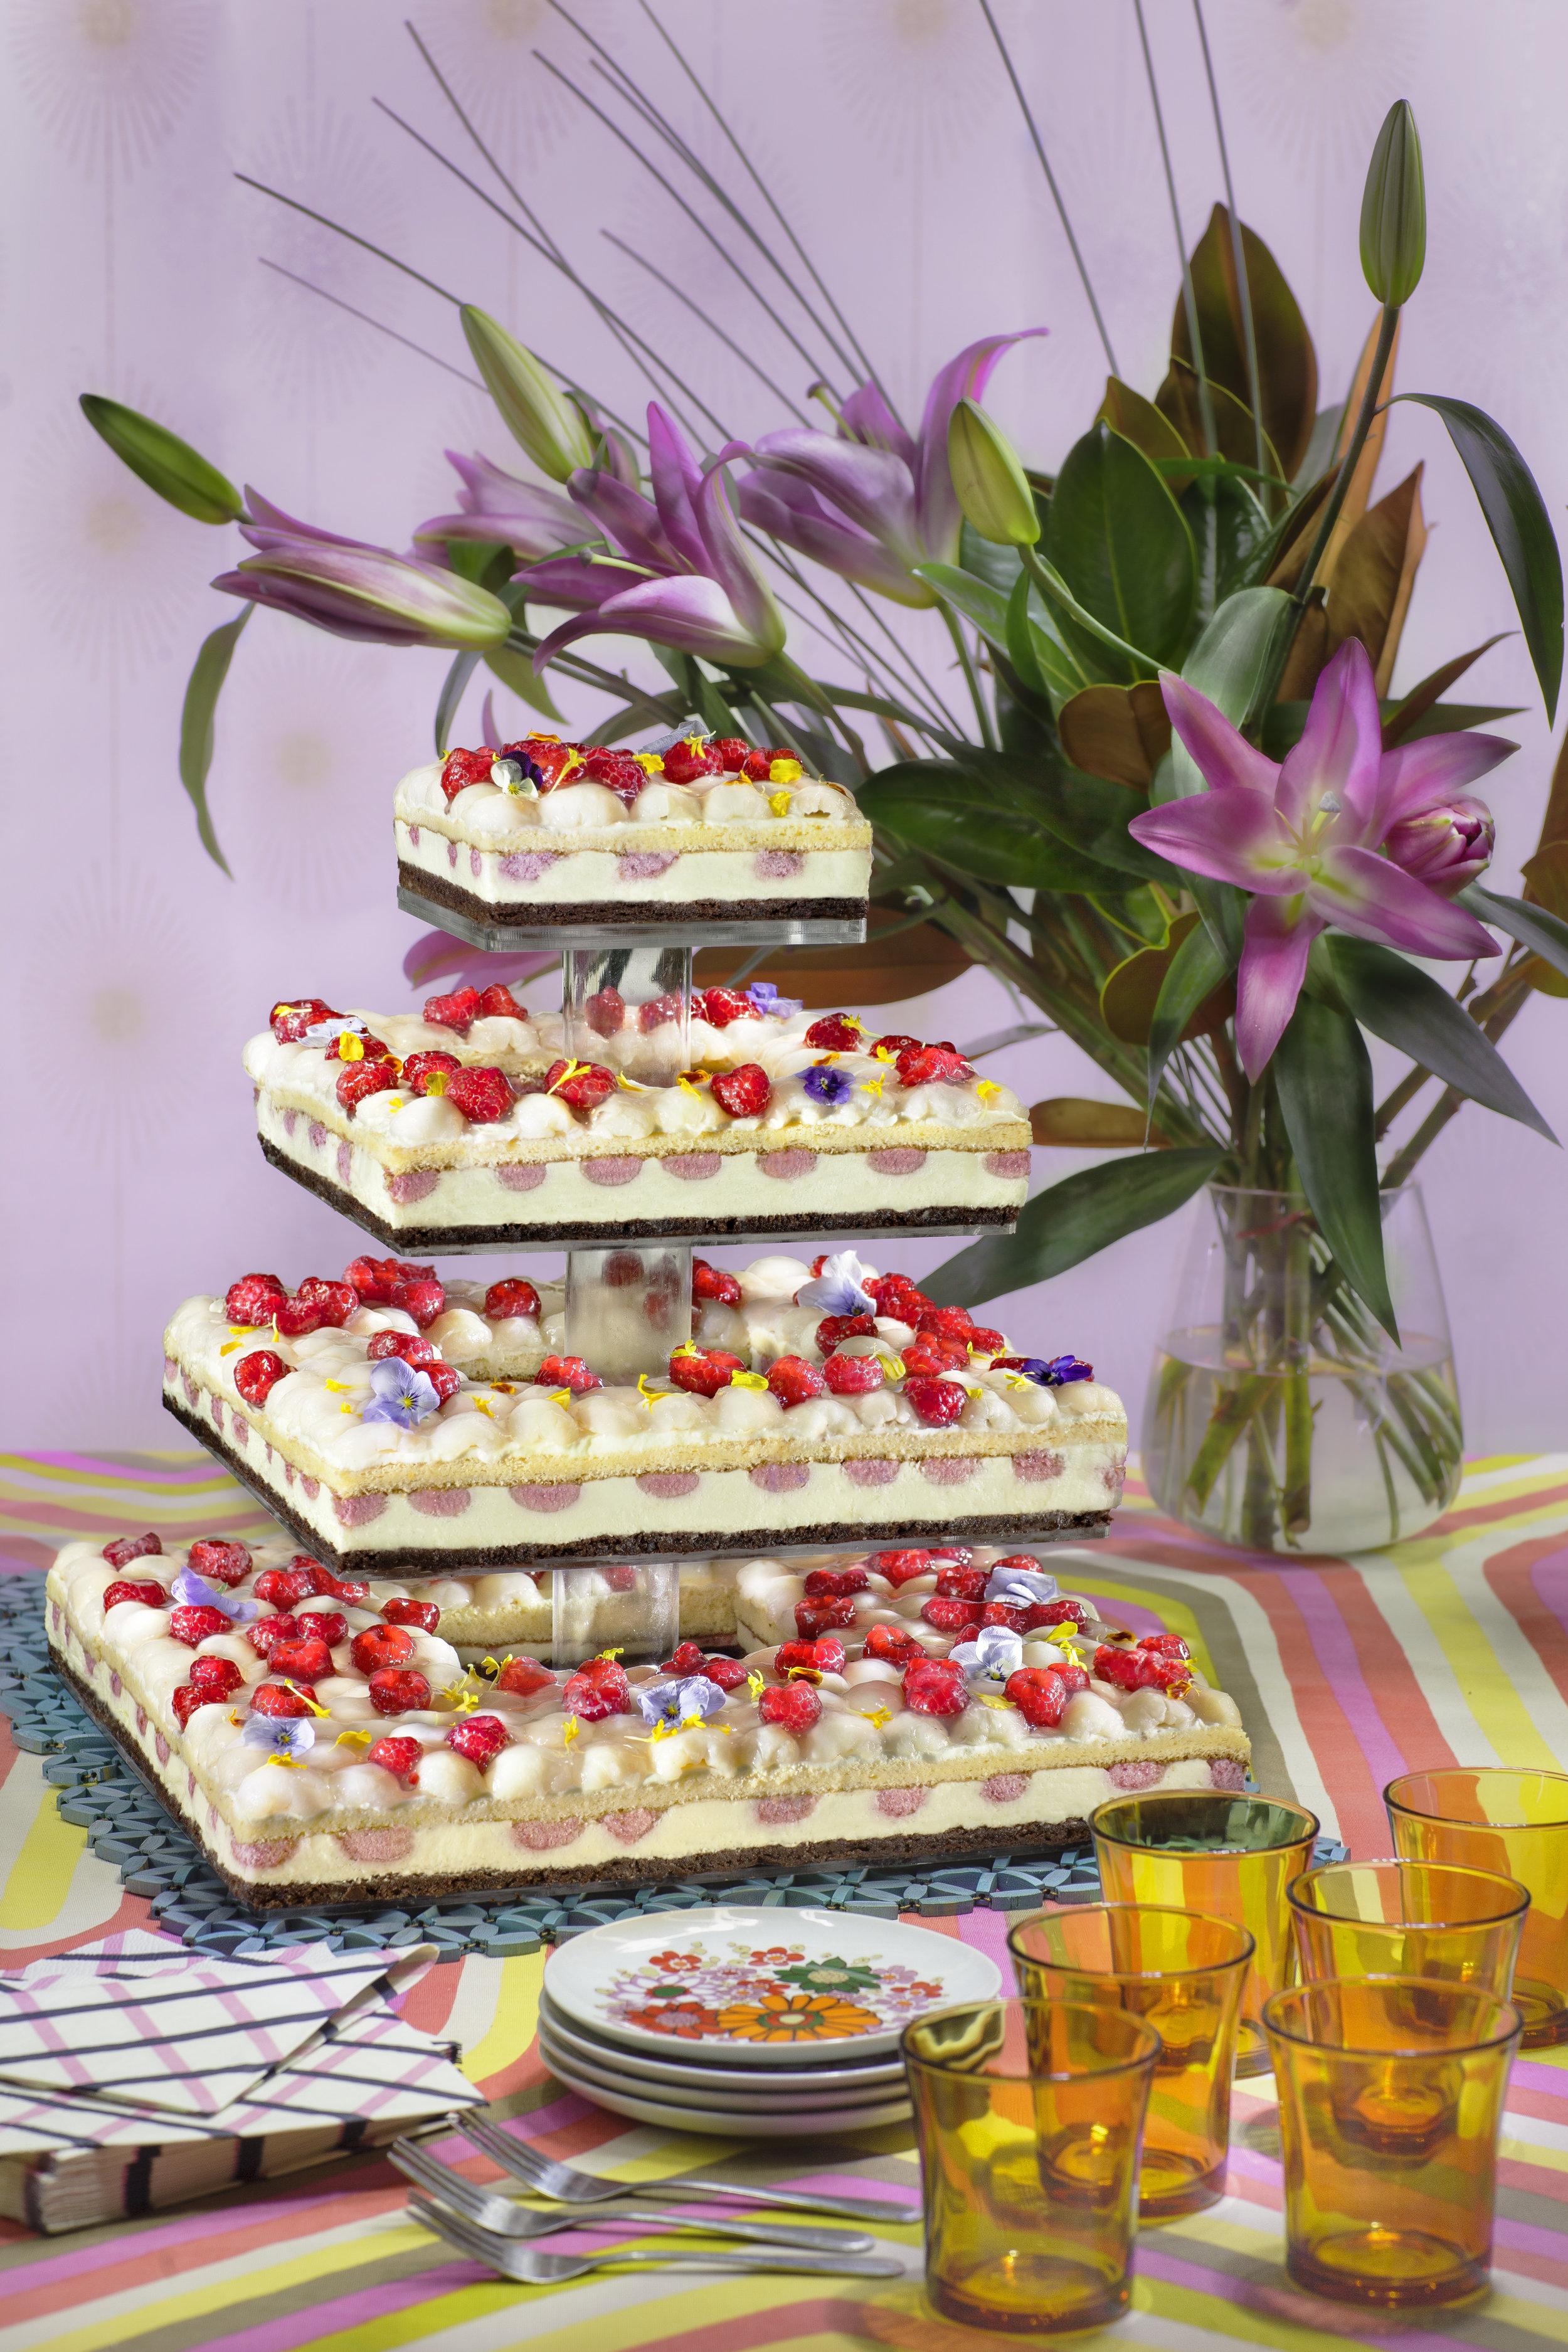 BSP-Lychee Strawberry Cake MV.jpg